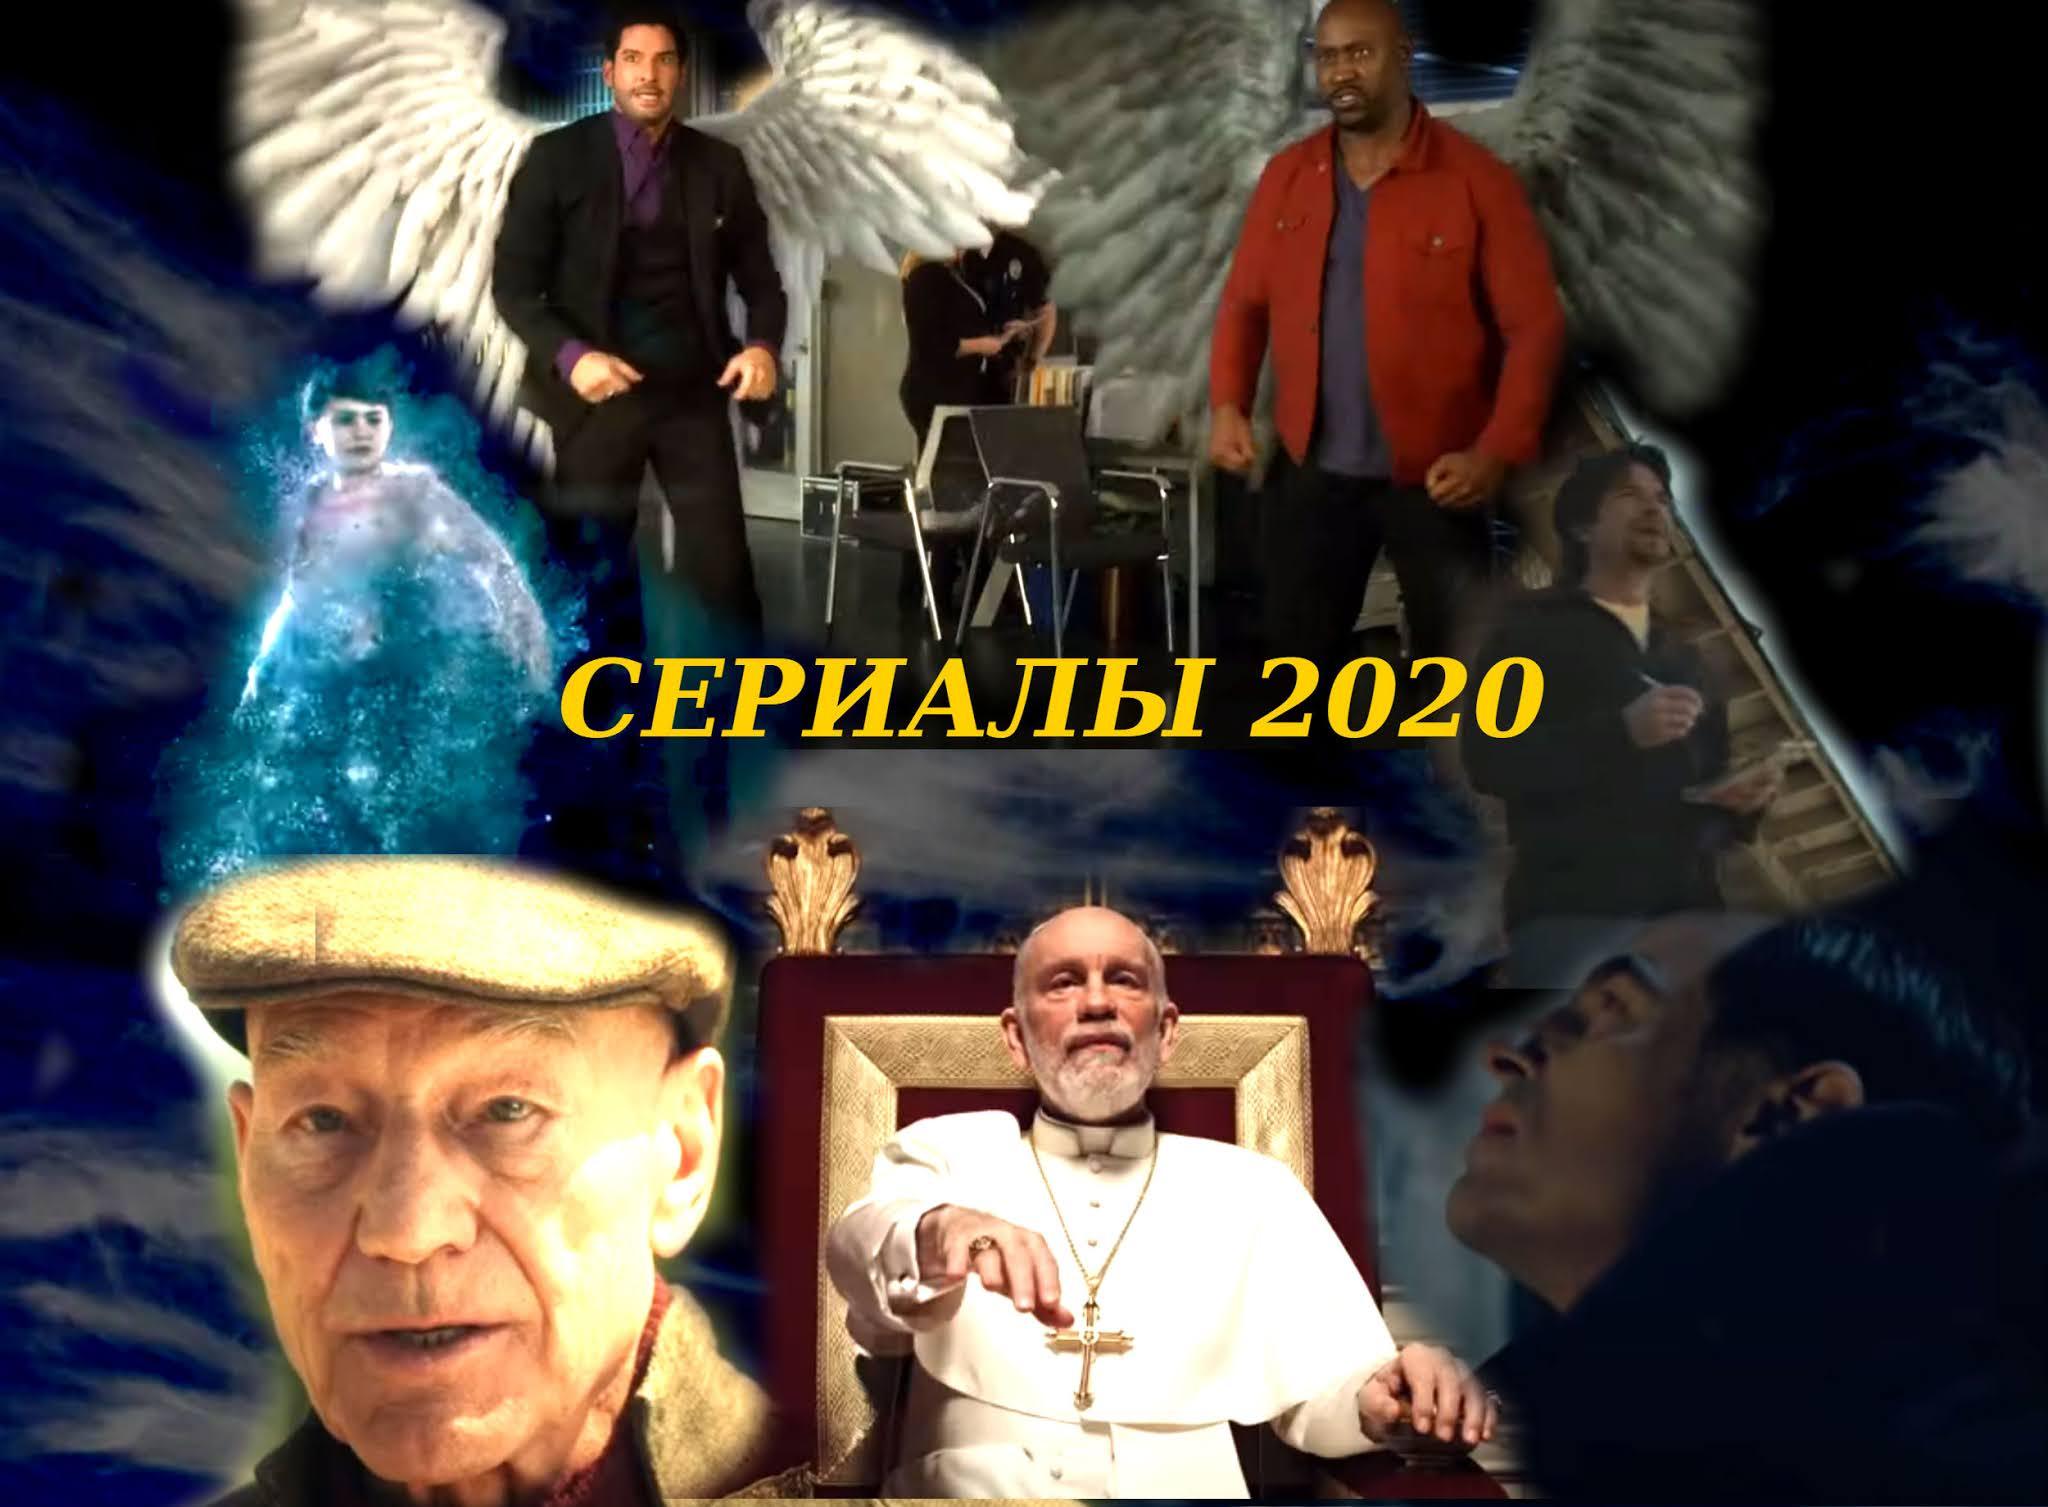 скриншоты сериалы 2020 года